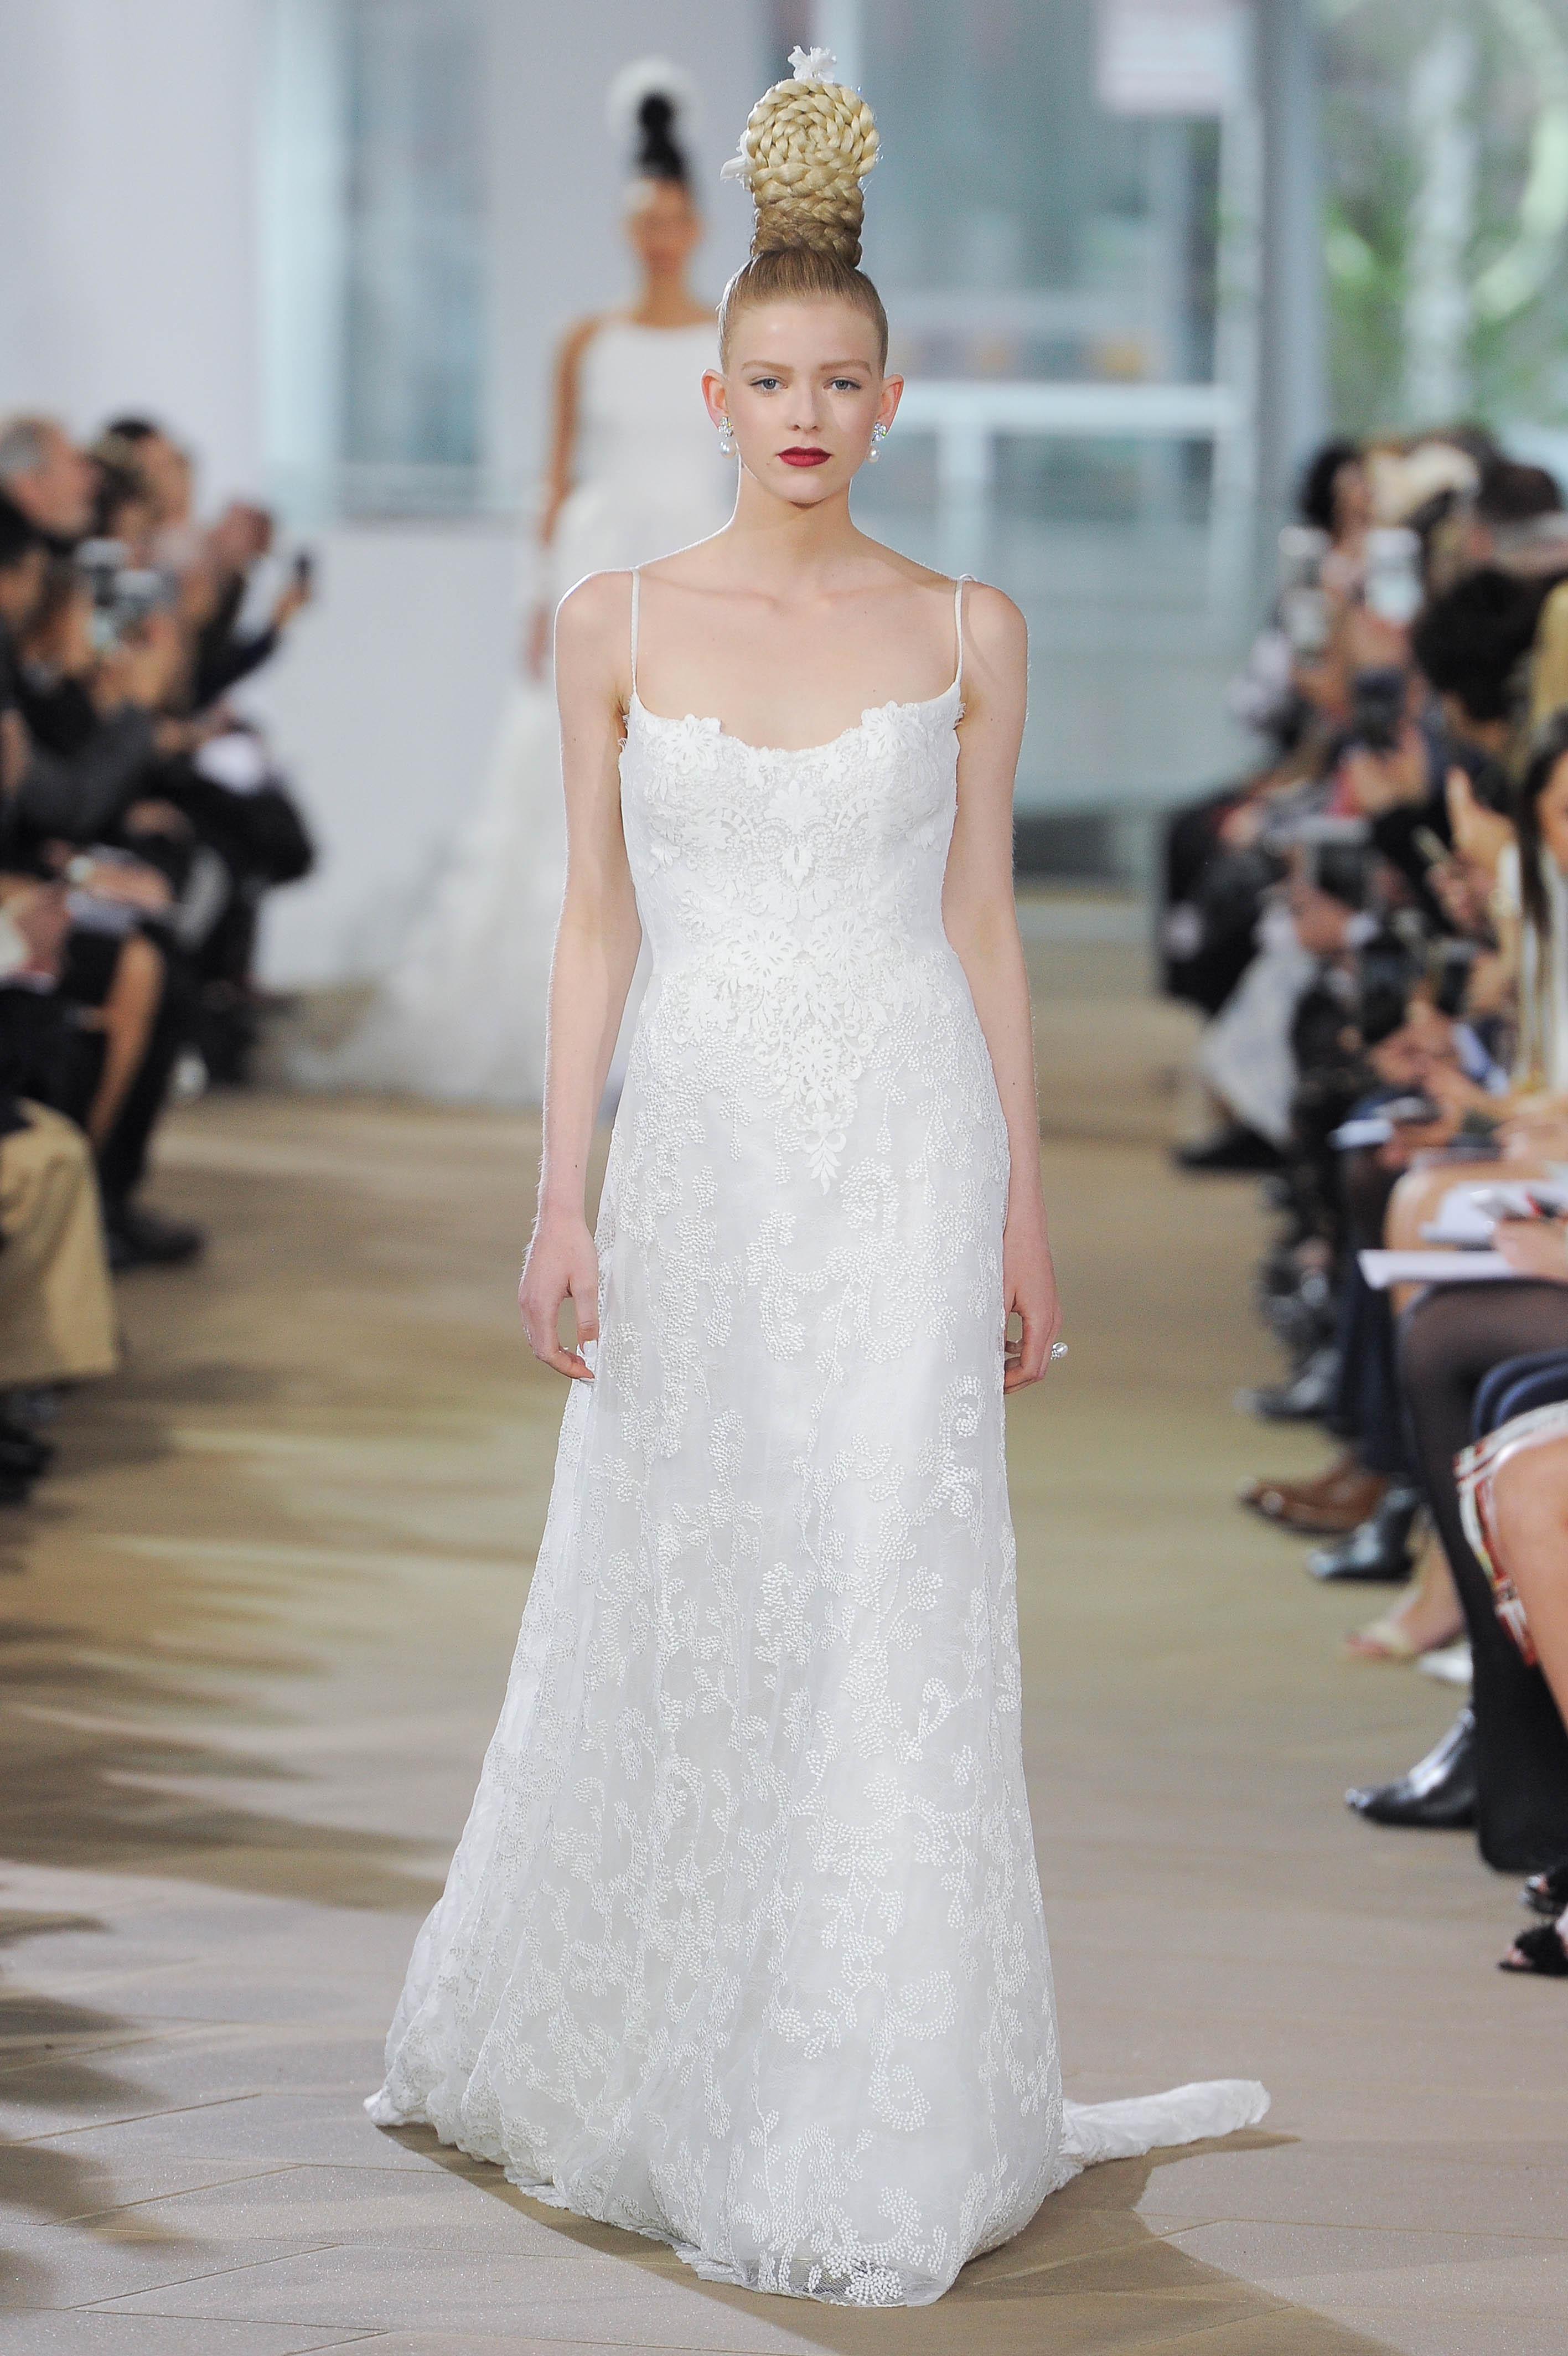 Ines Di Santo Spaghetti Strap Wedding Dress with Lace Spring 2018